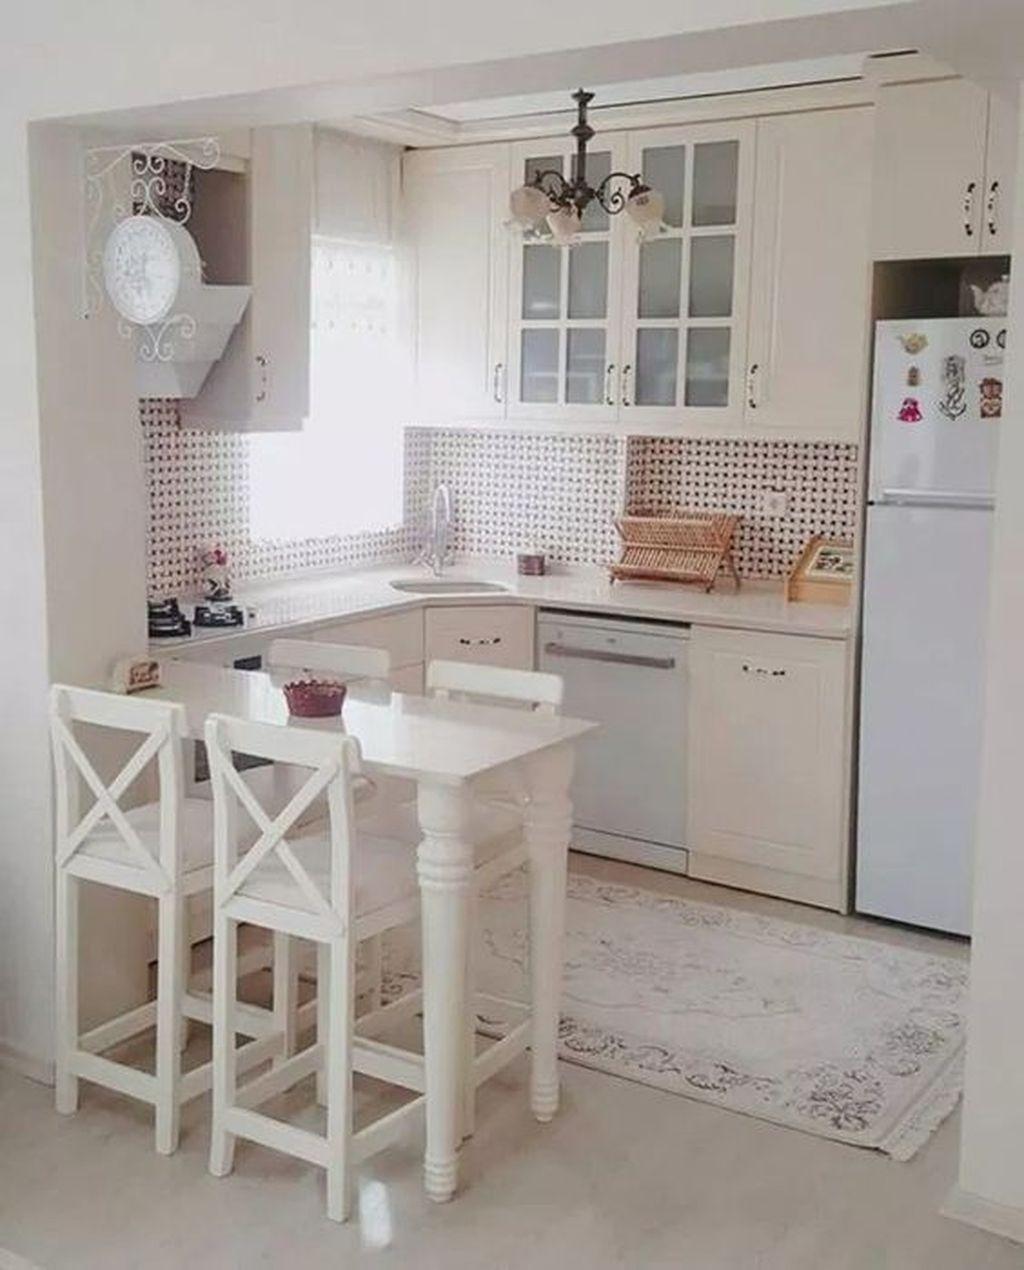 Brilliant Small Kitchen Remodel Design Ideas On A Budget 21